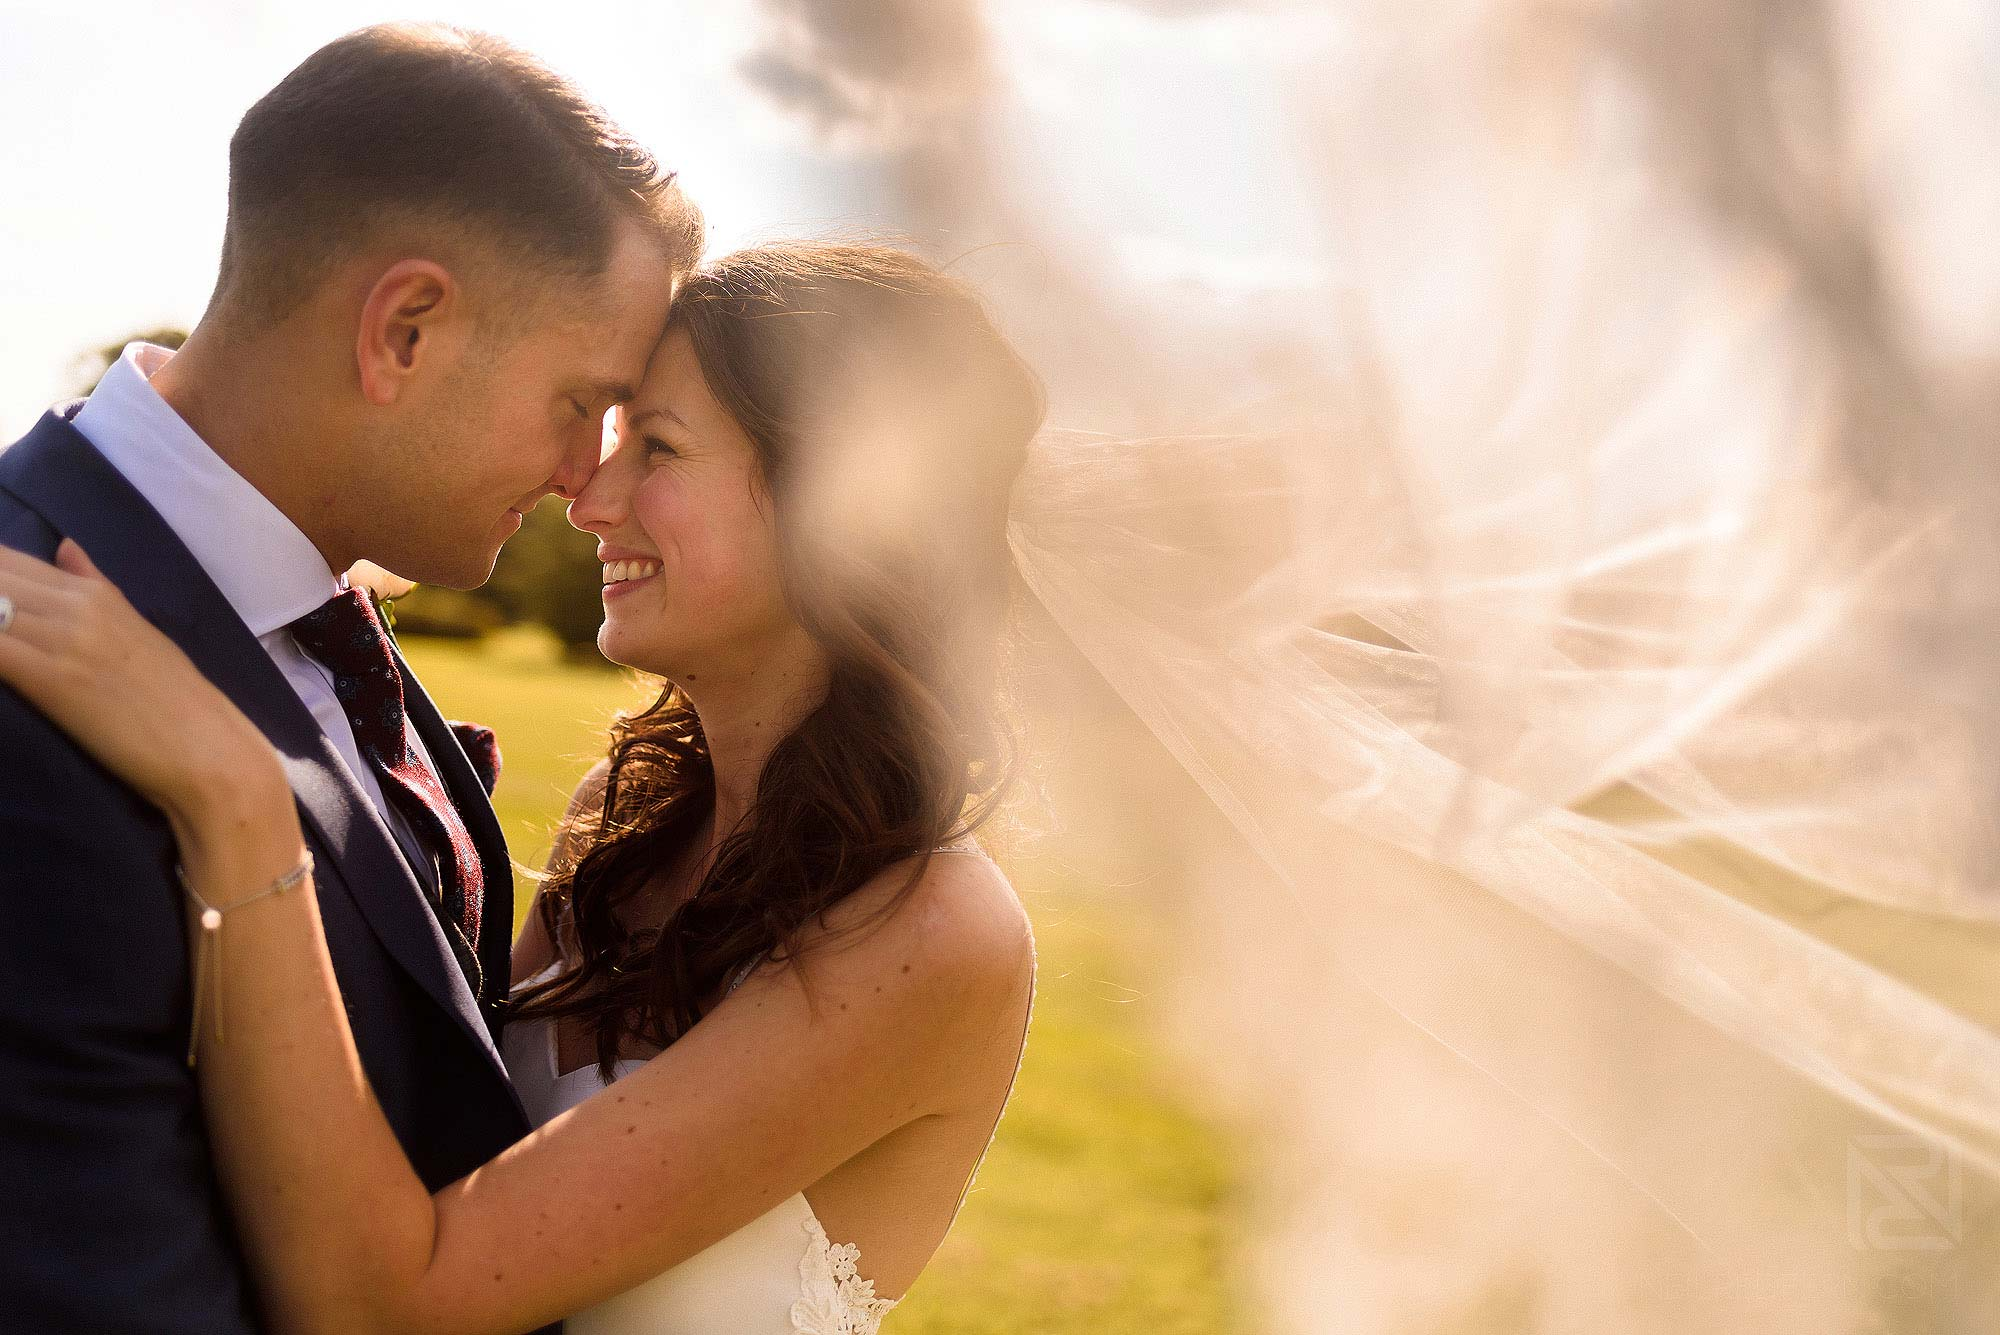 portrait of smiling newlyweds